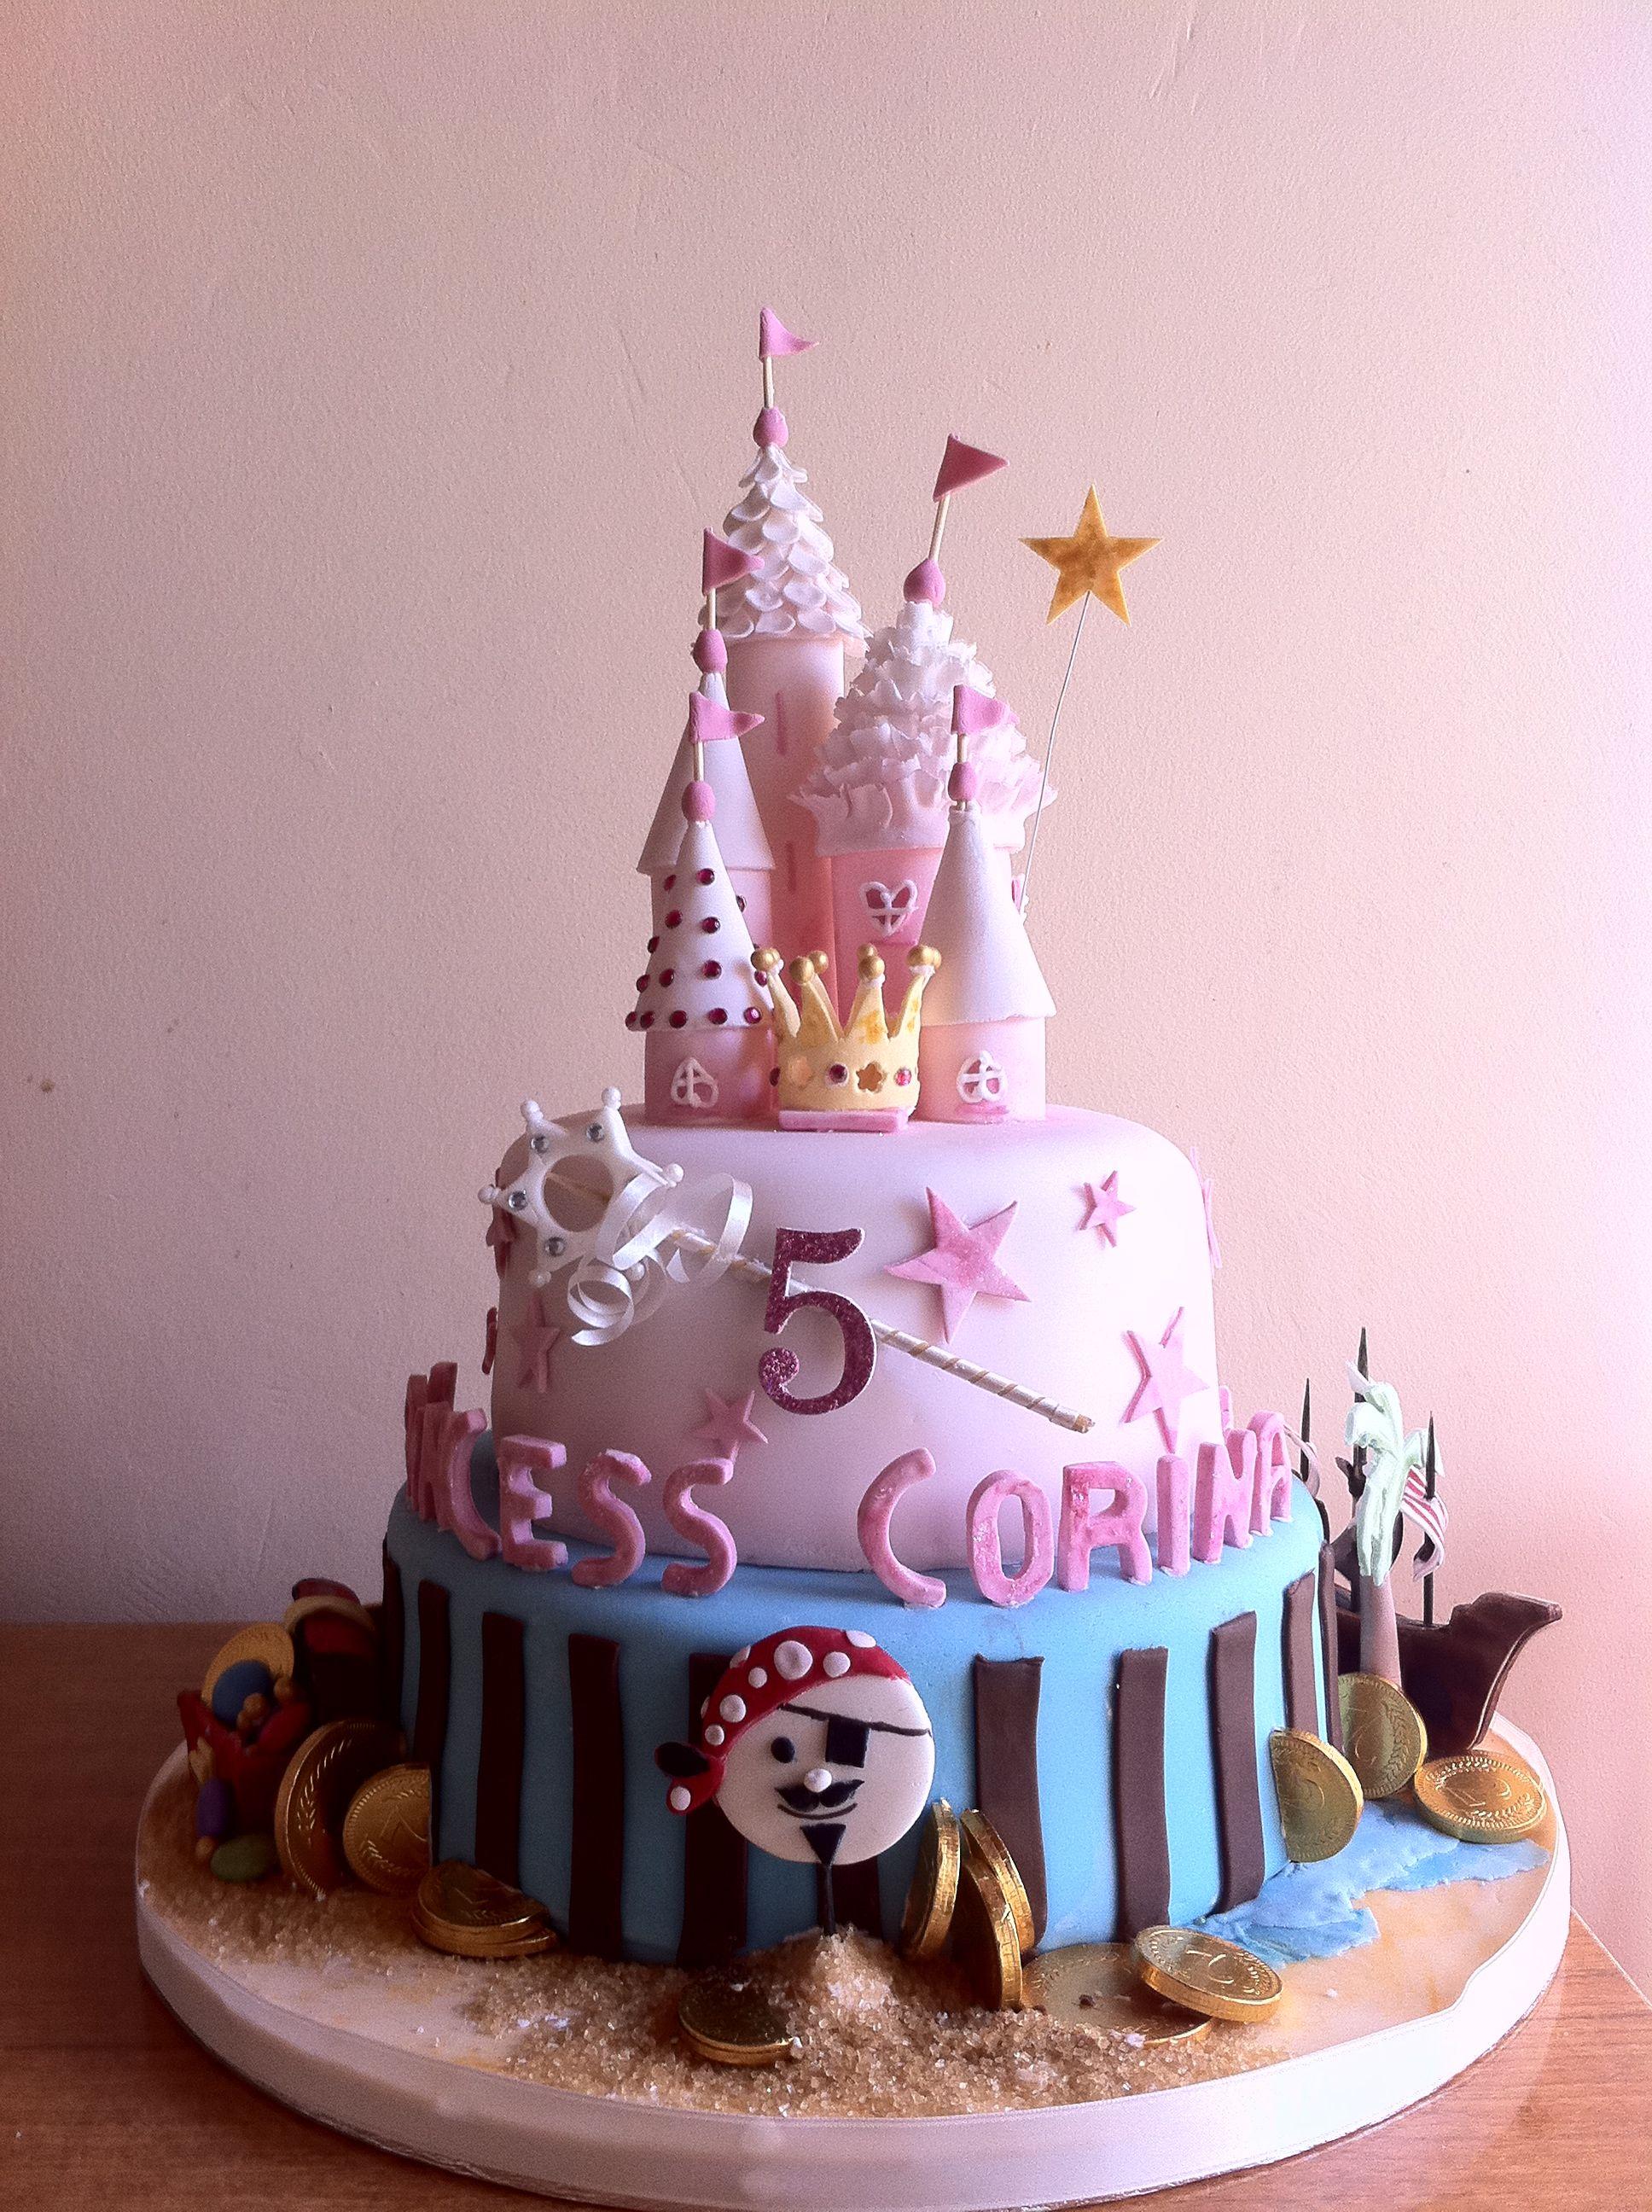 Cake ideas on pinterest pirate cakes marshmallow fondant and -  Princess Pirates Birthday Cake